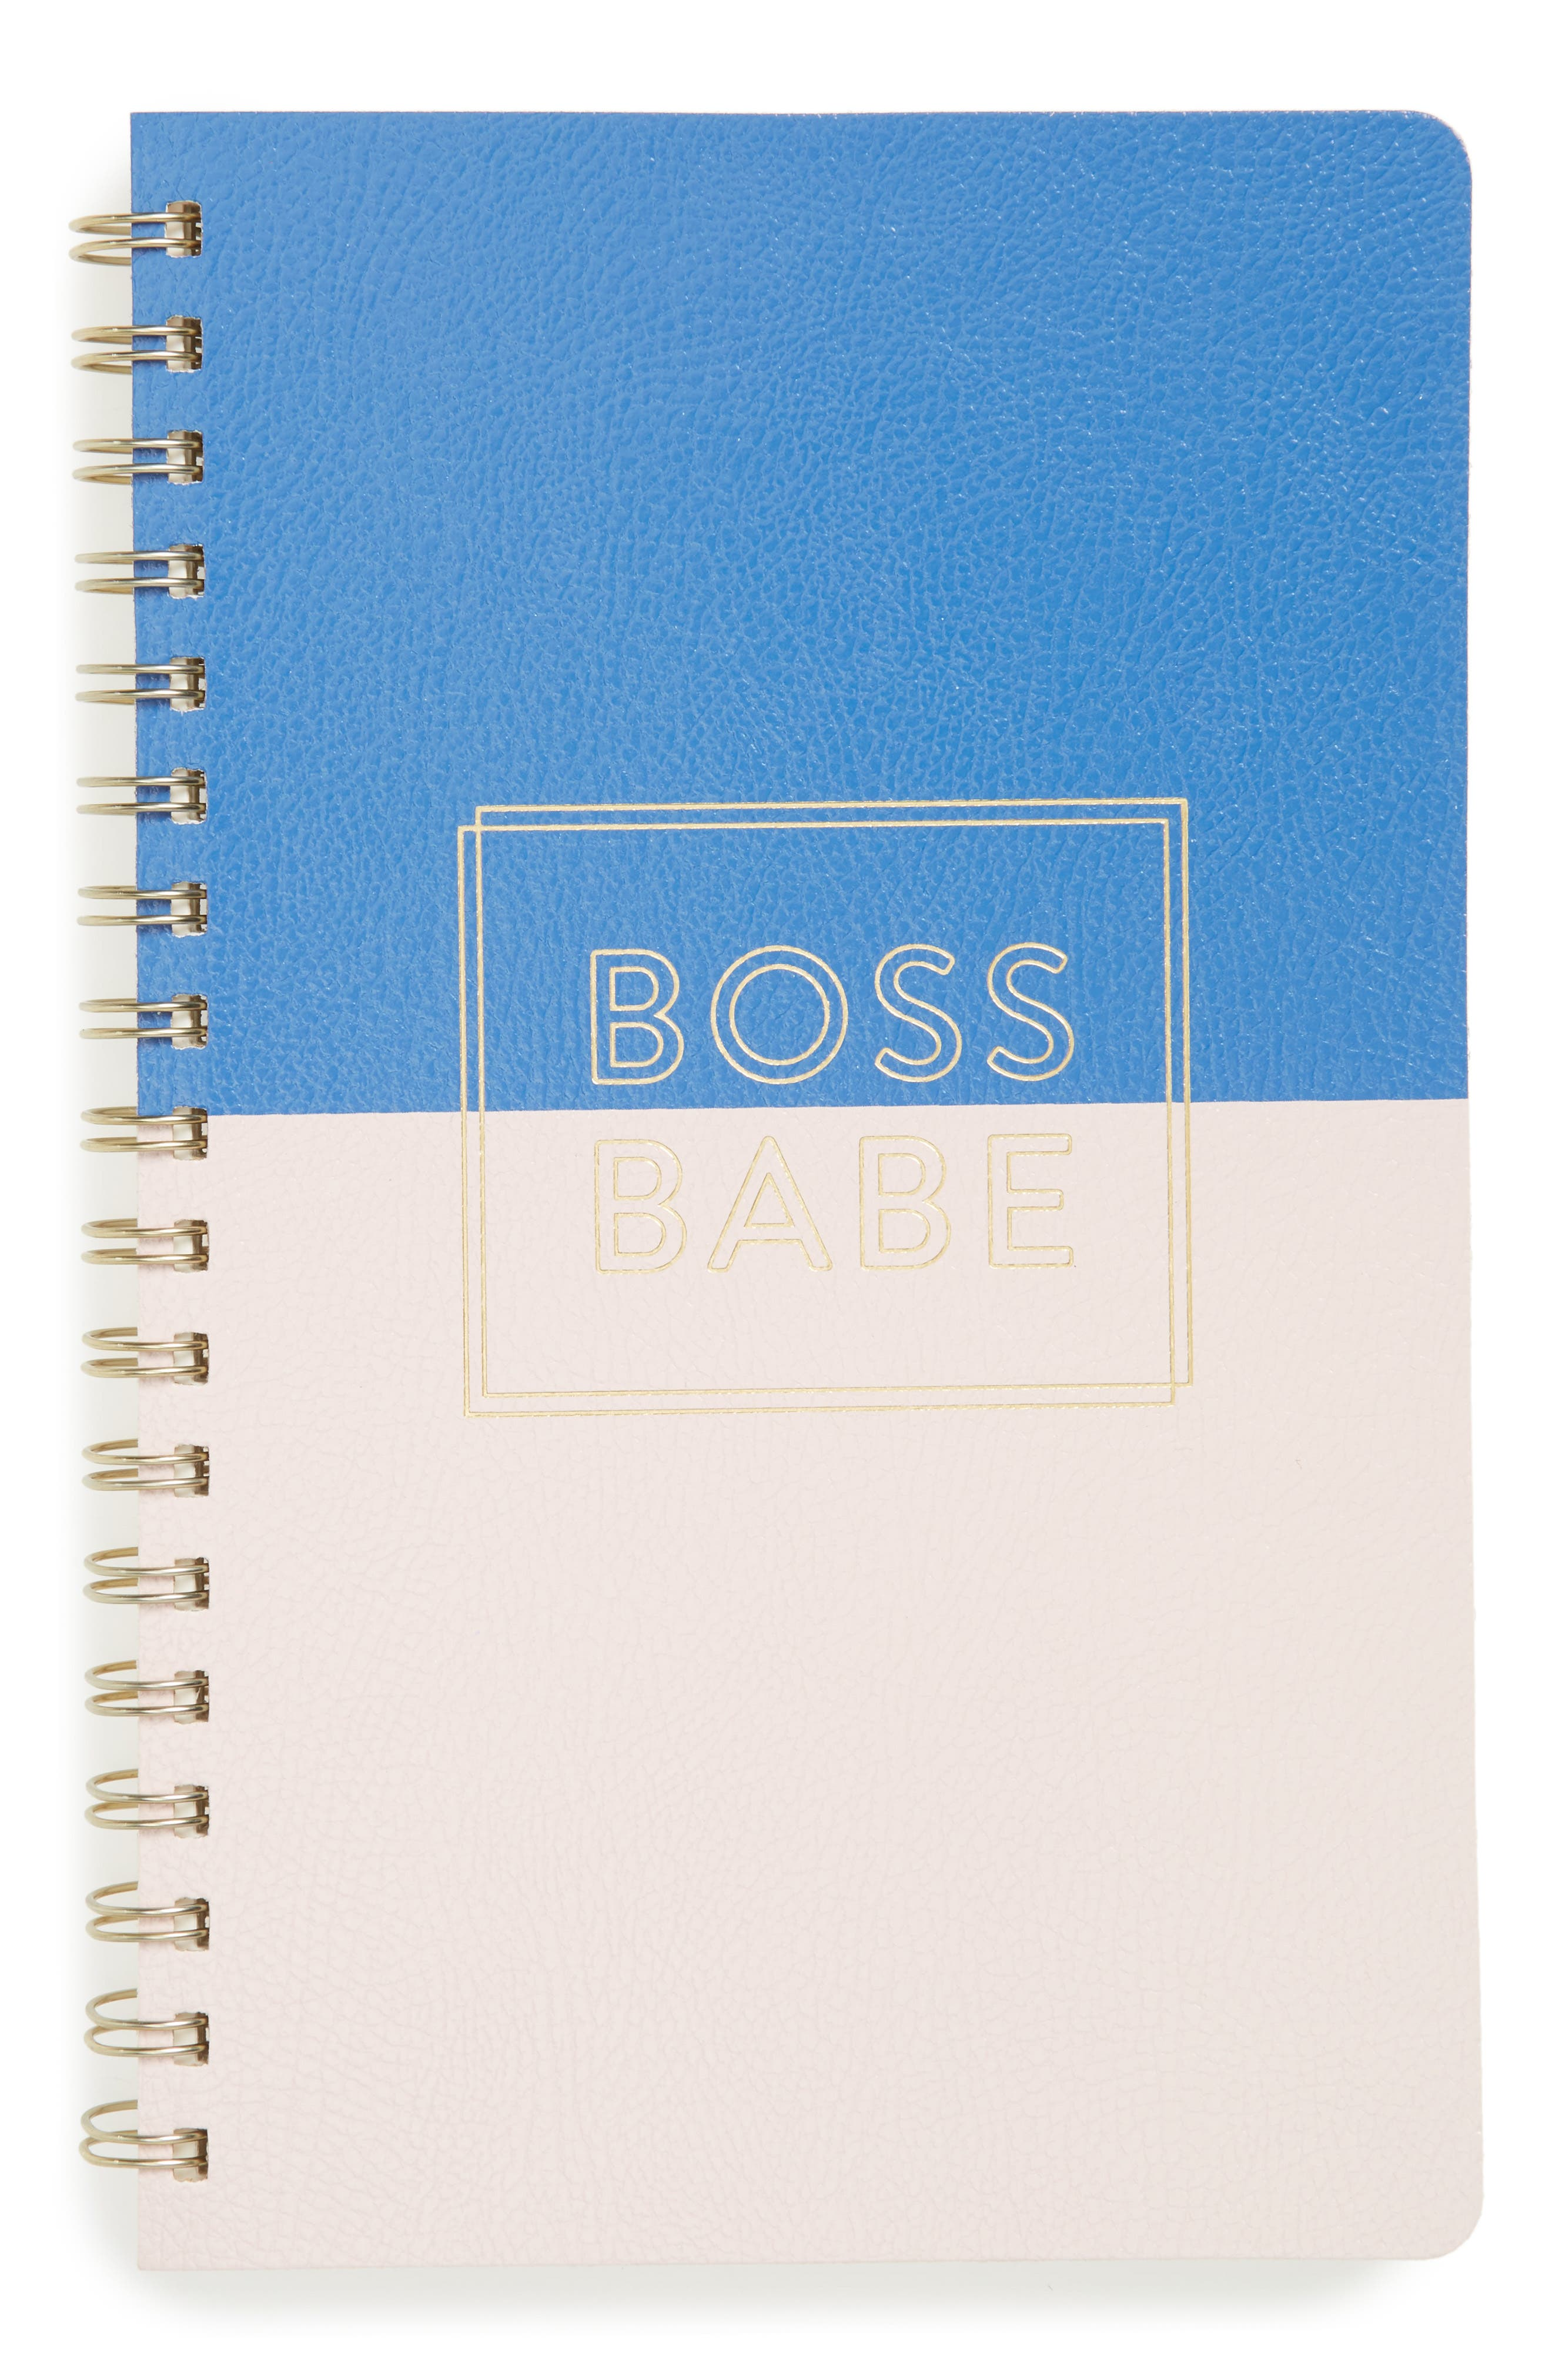 Alternate Image 1 Selected - Fringe Studio Boss Babe Spiral Notebook